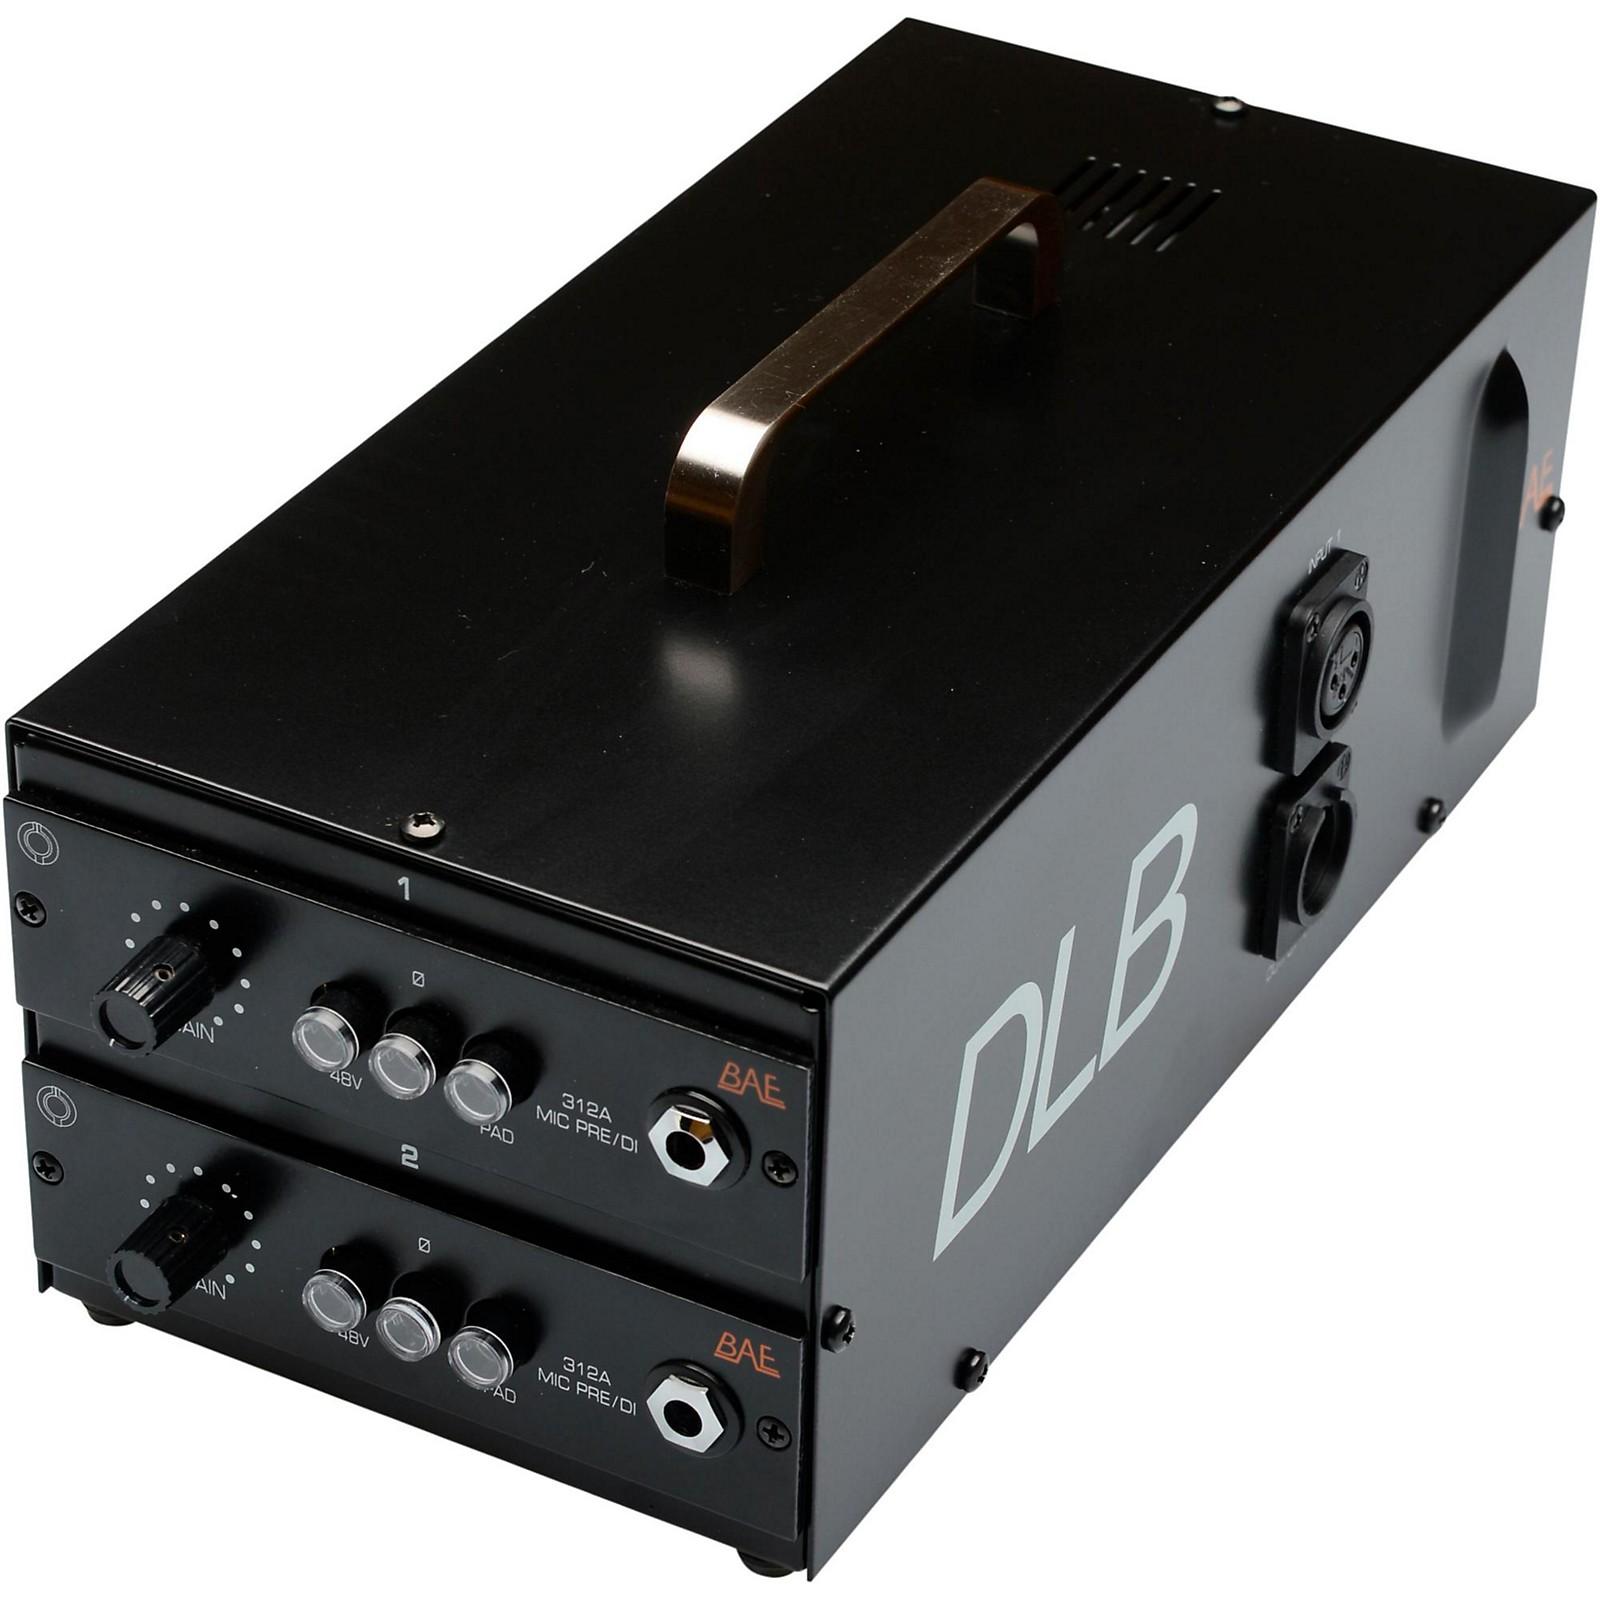 BAE Desktop Lunchbox